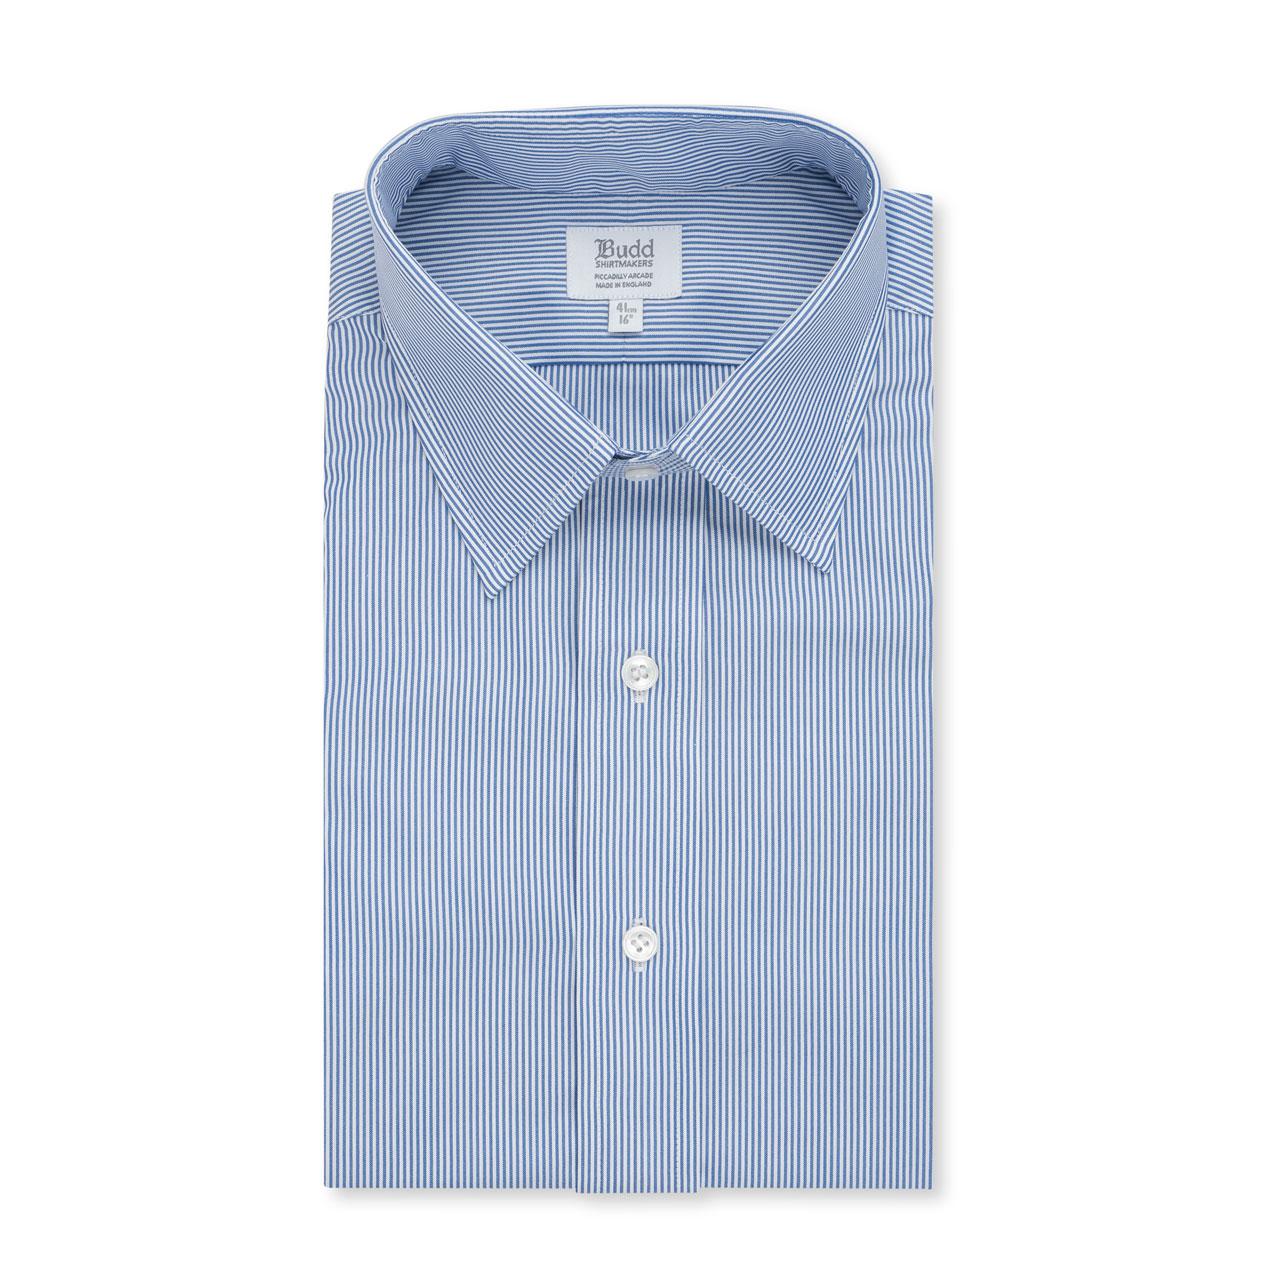 Classic Fit Neat Stripe Poplin Double Cuff Shirt in Navy